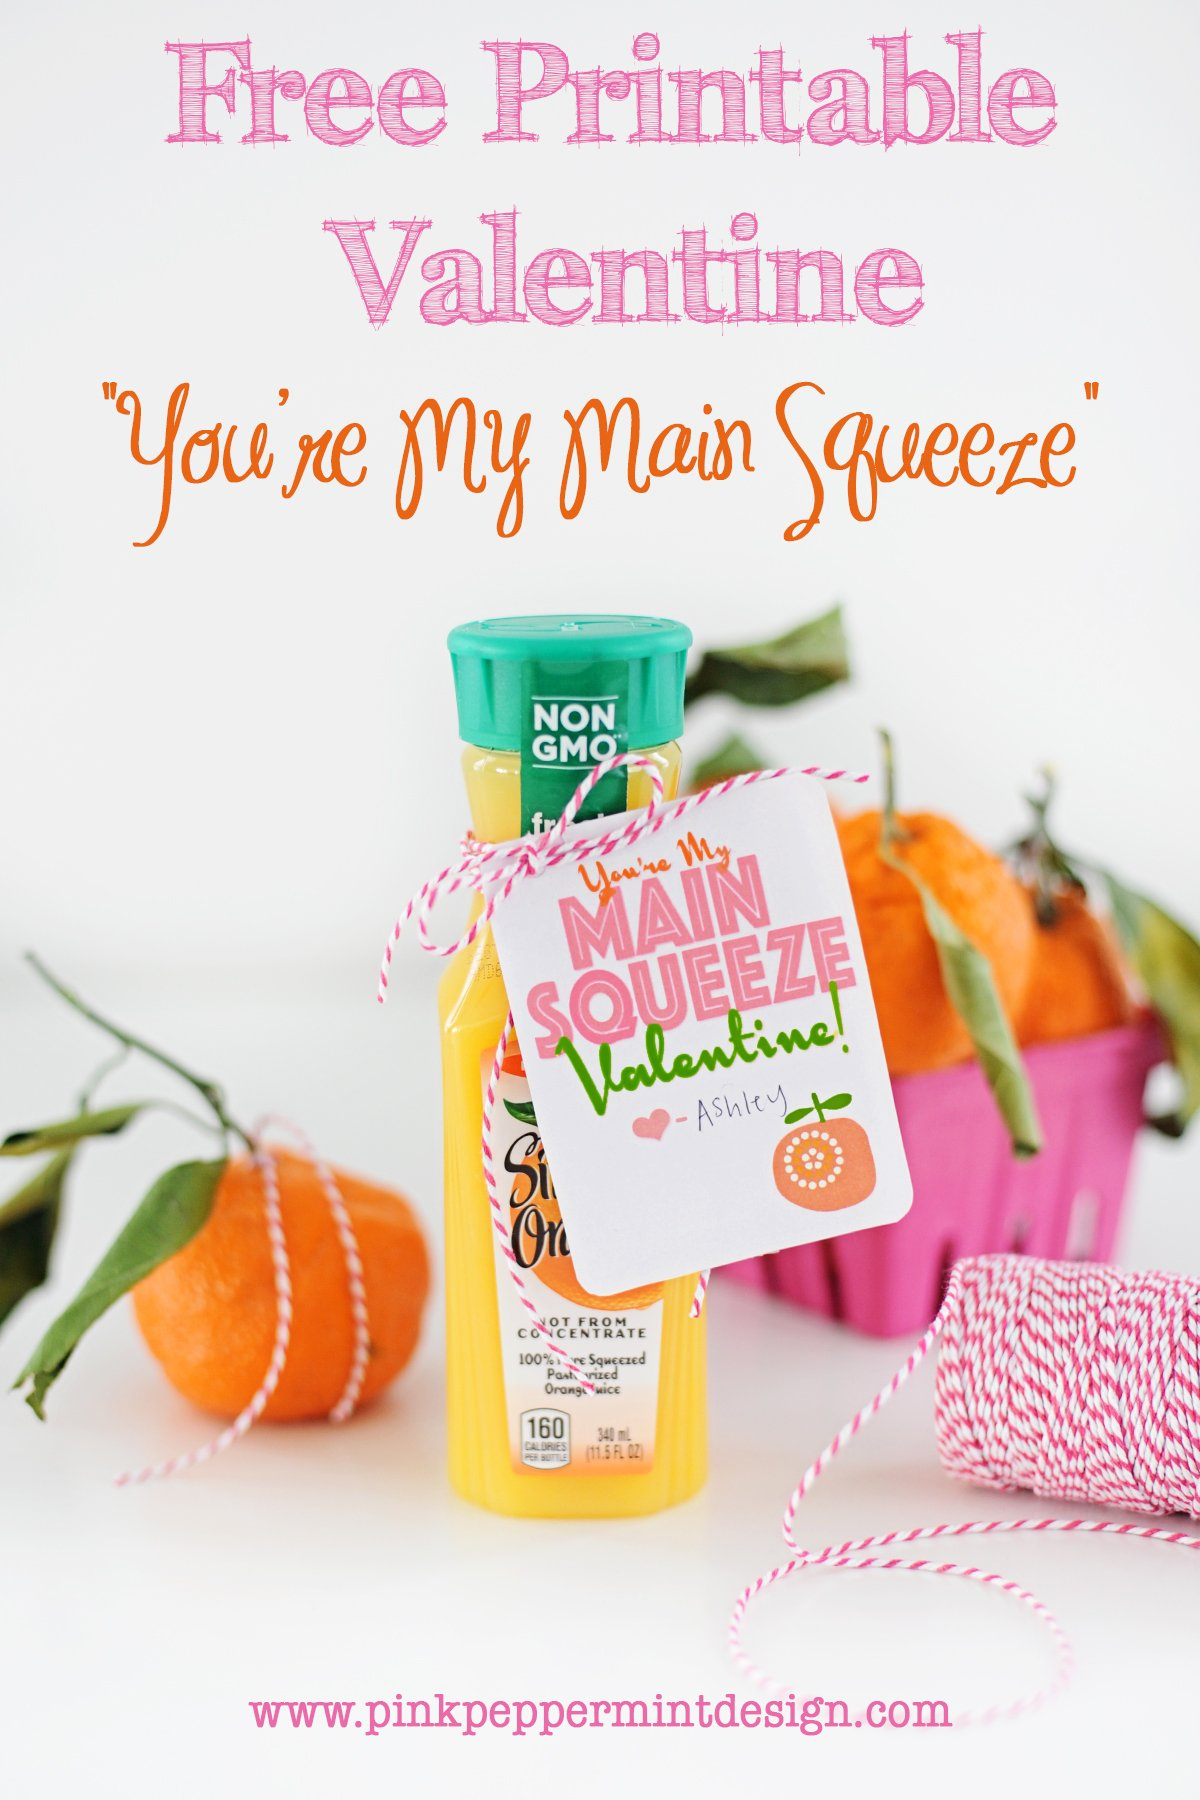 DIY Handmade Free Printable Valentine for kids party ideas